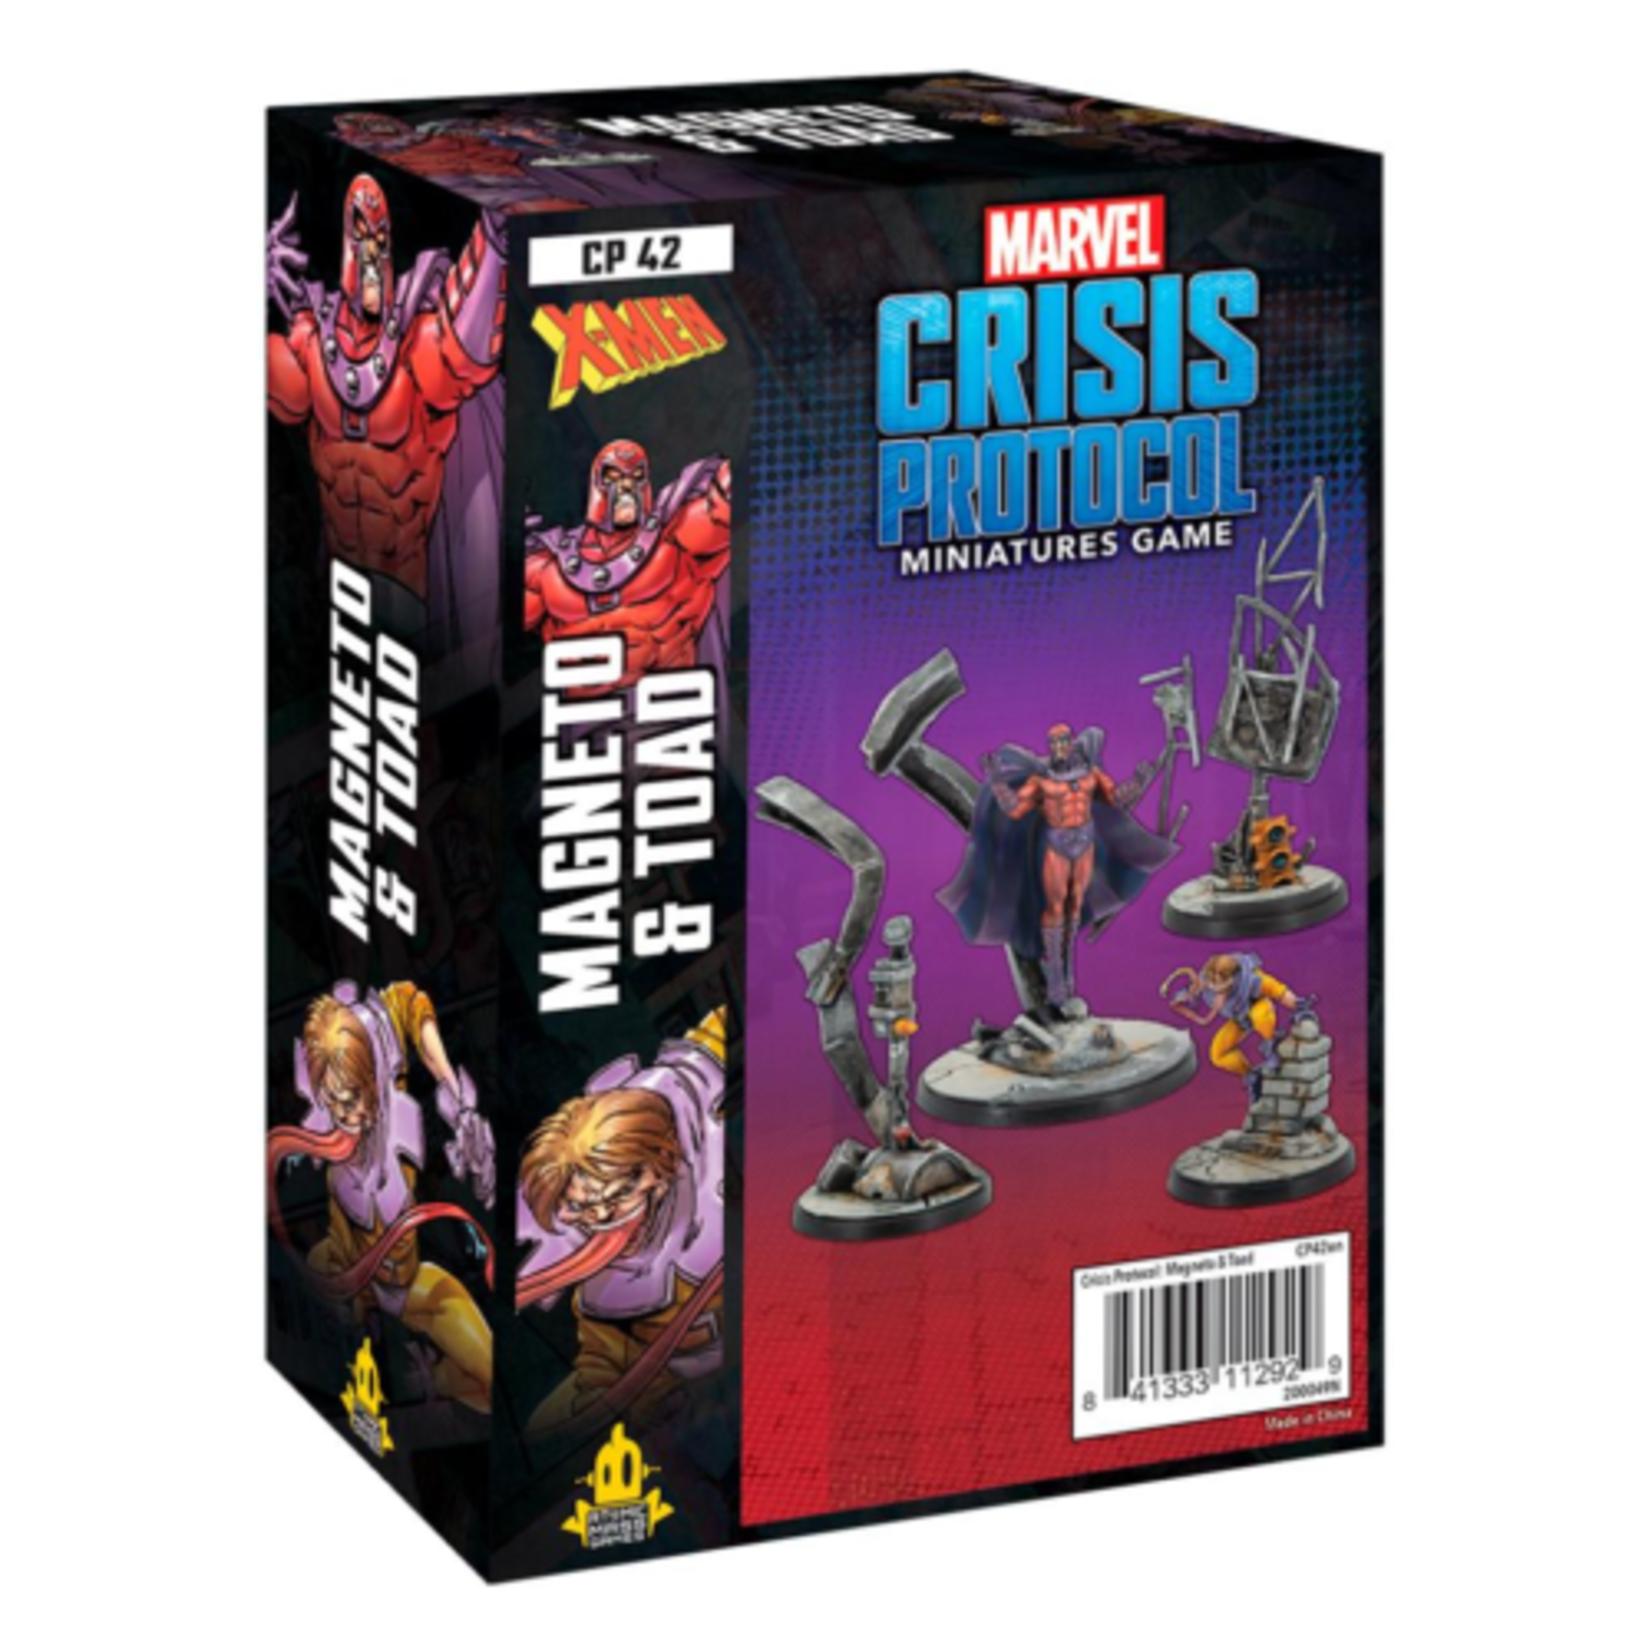 Marvel Crisis Protocol - Magneto & Toad